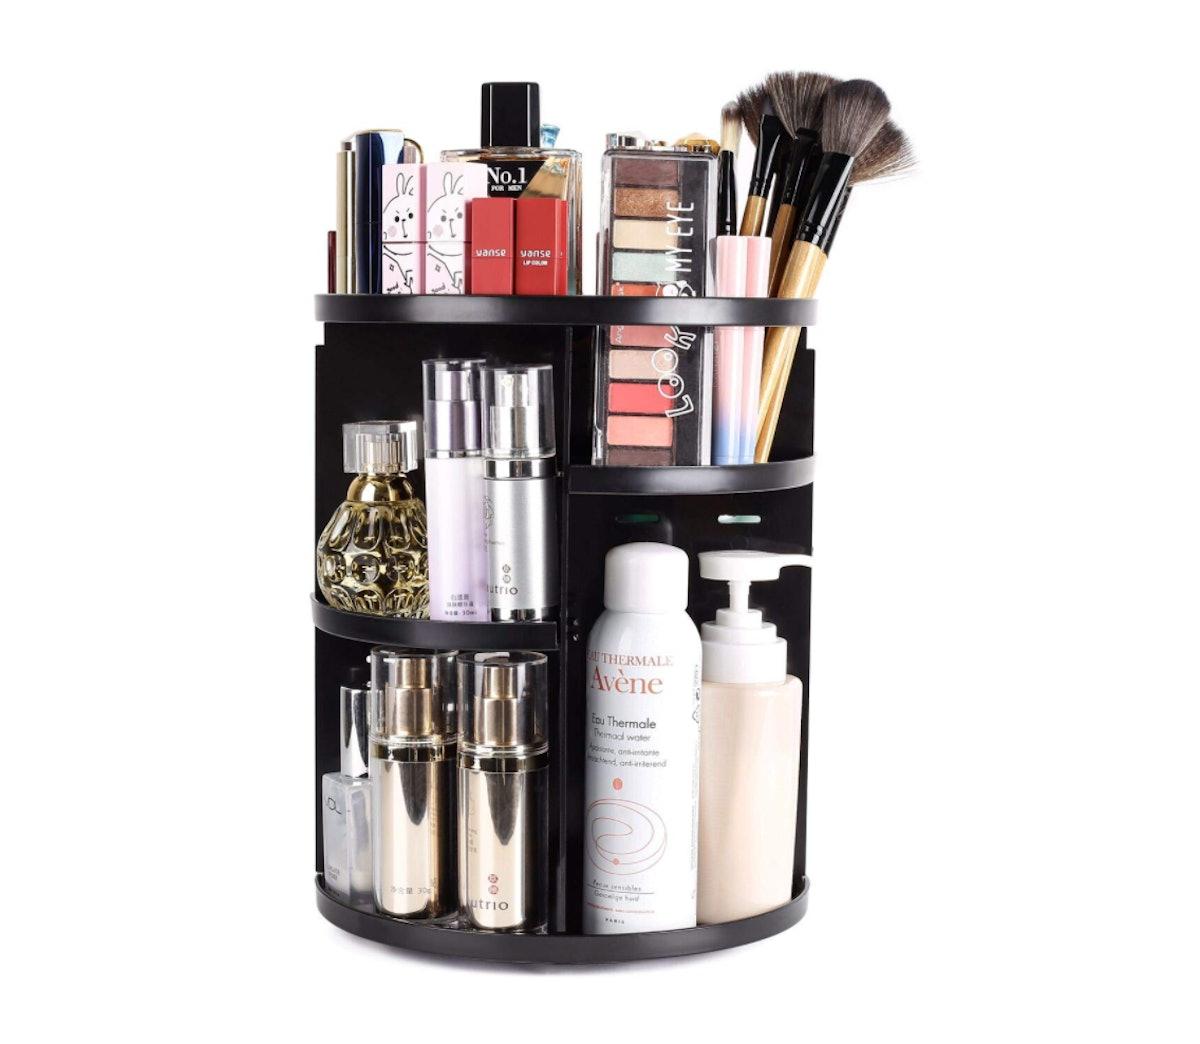 sanipoe Rotating Makeup Organizer